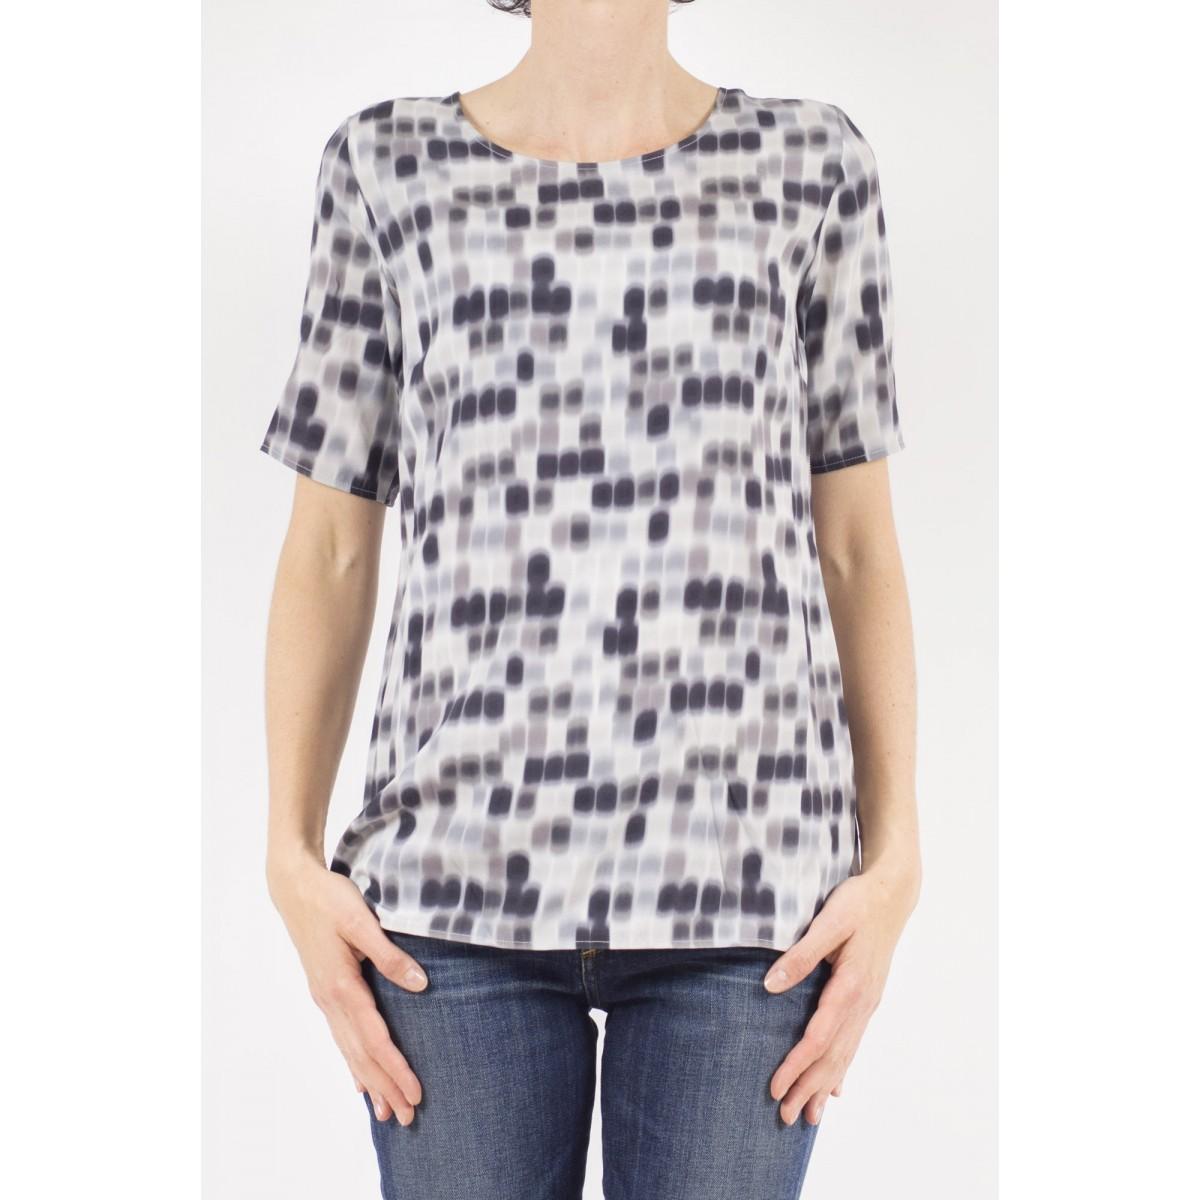 T-shirt donna Kangra - 7825/01 t-shirt seta stampa 29 - grigio